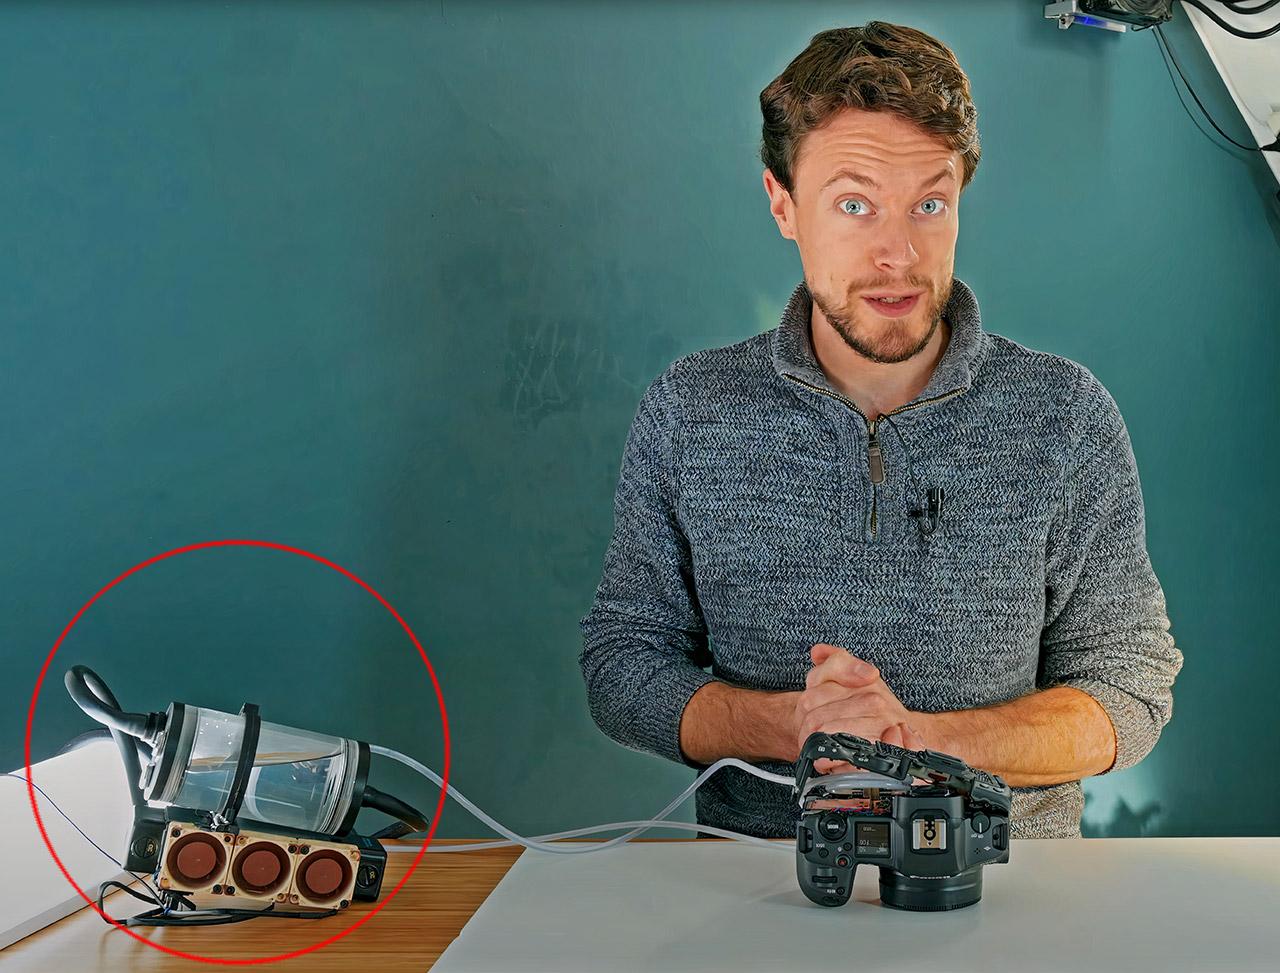 Watercool Canon R5 DSLR Camera